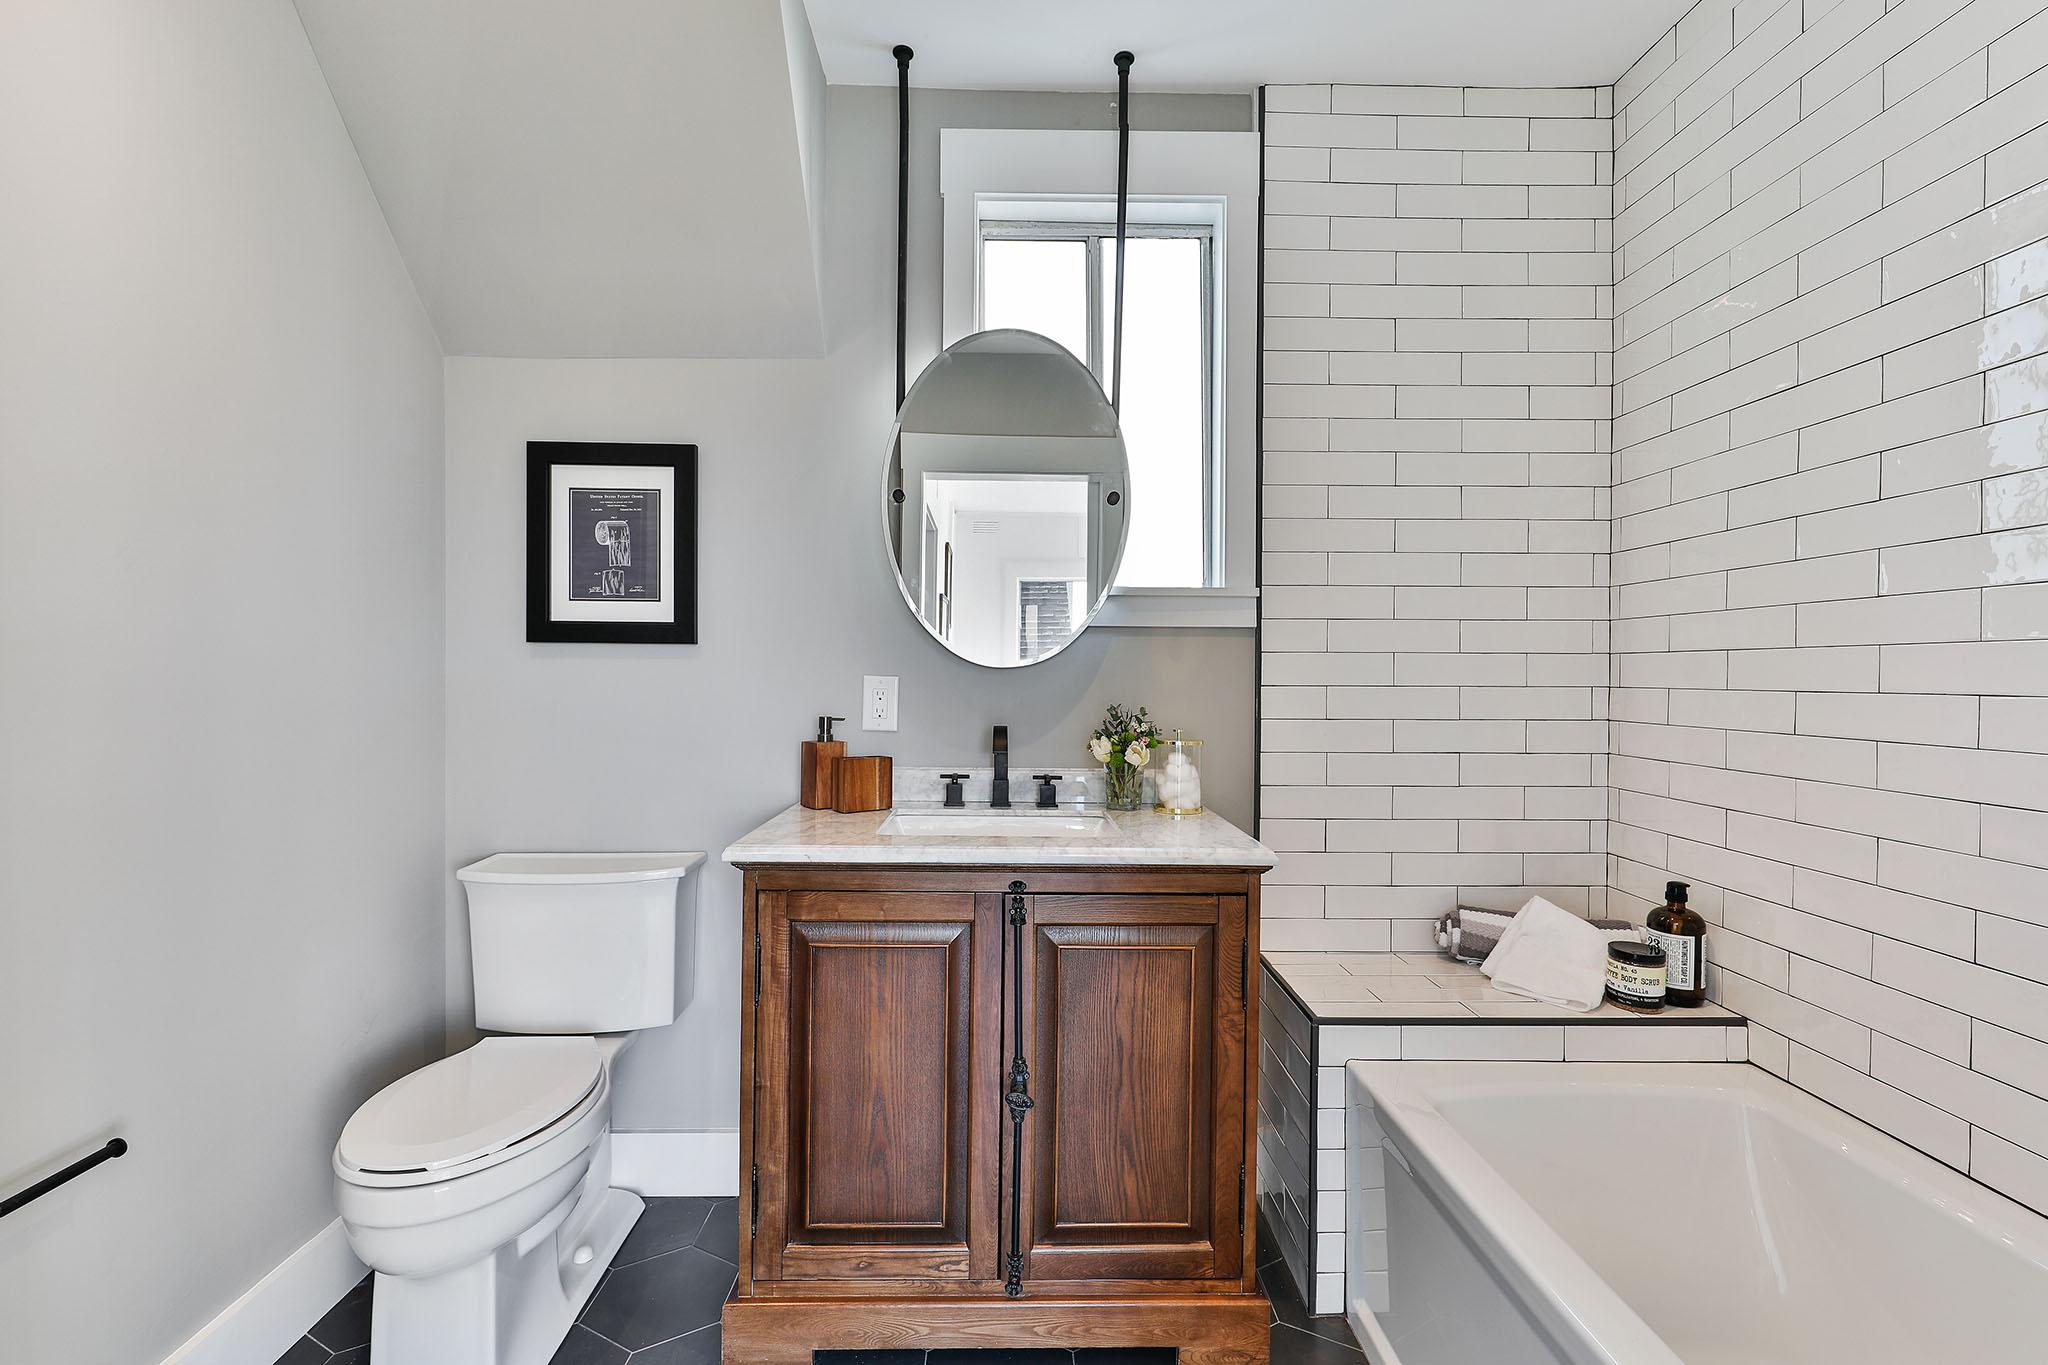 San Francisco Real Estate - Full Bathroom